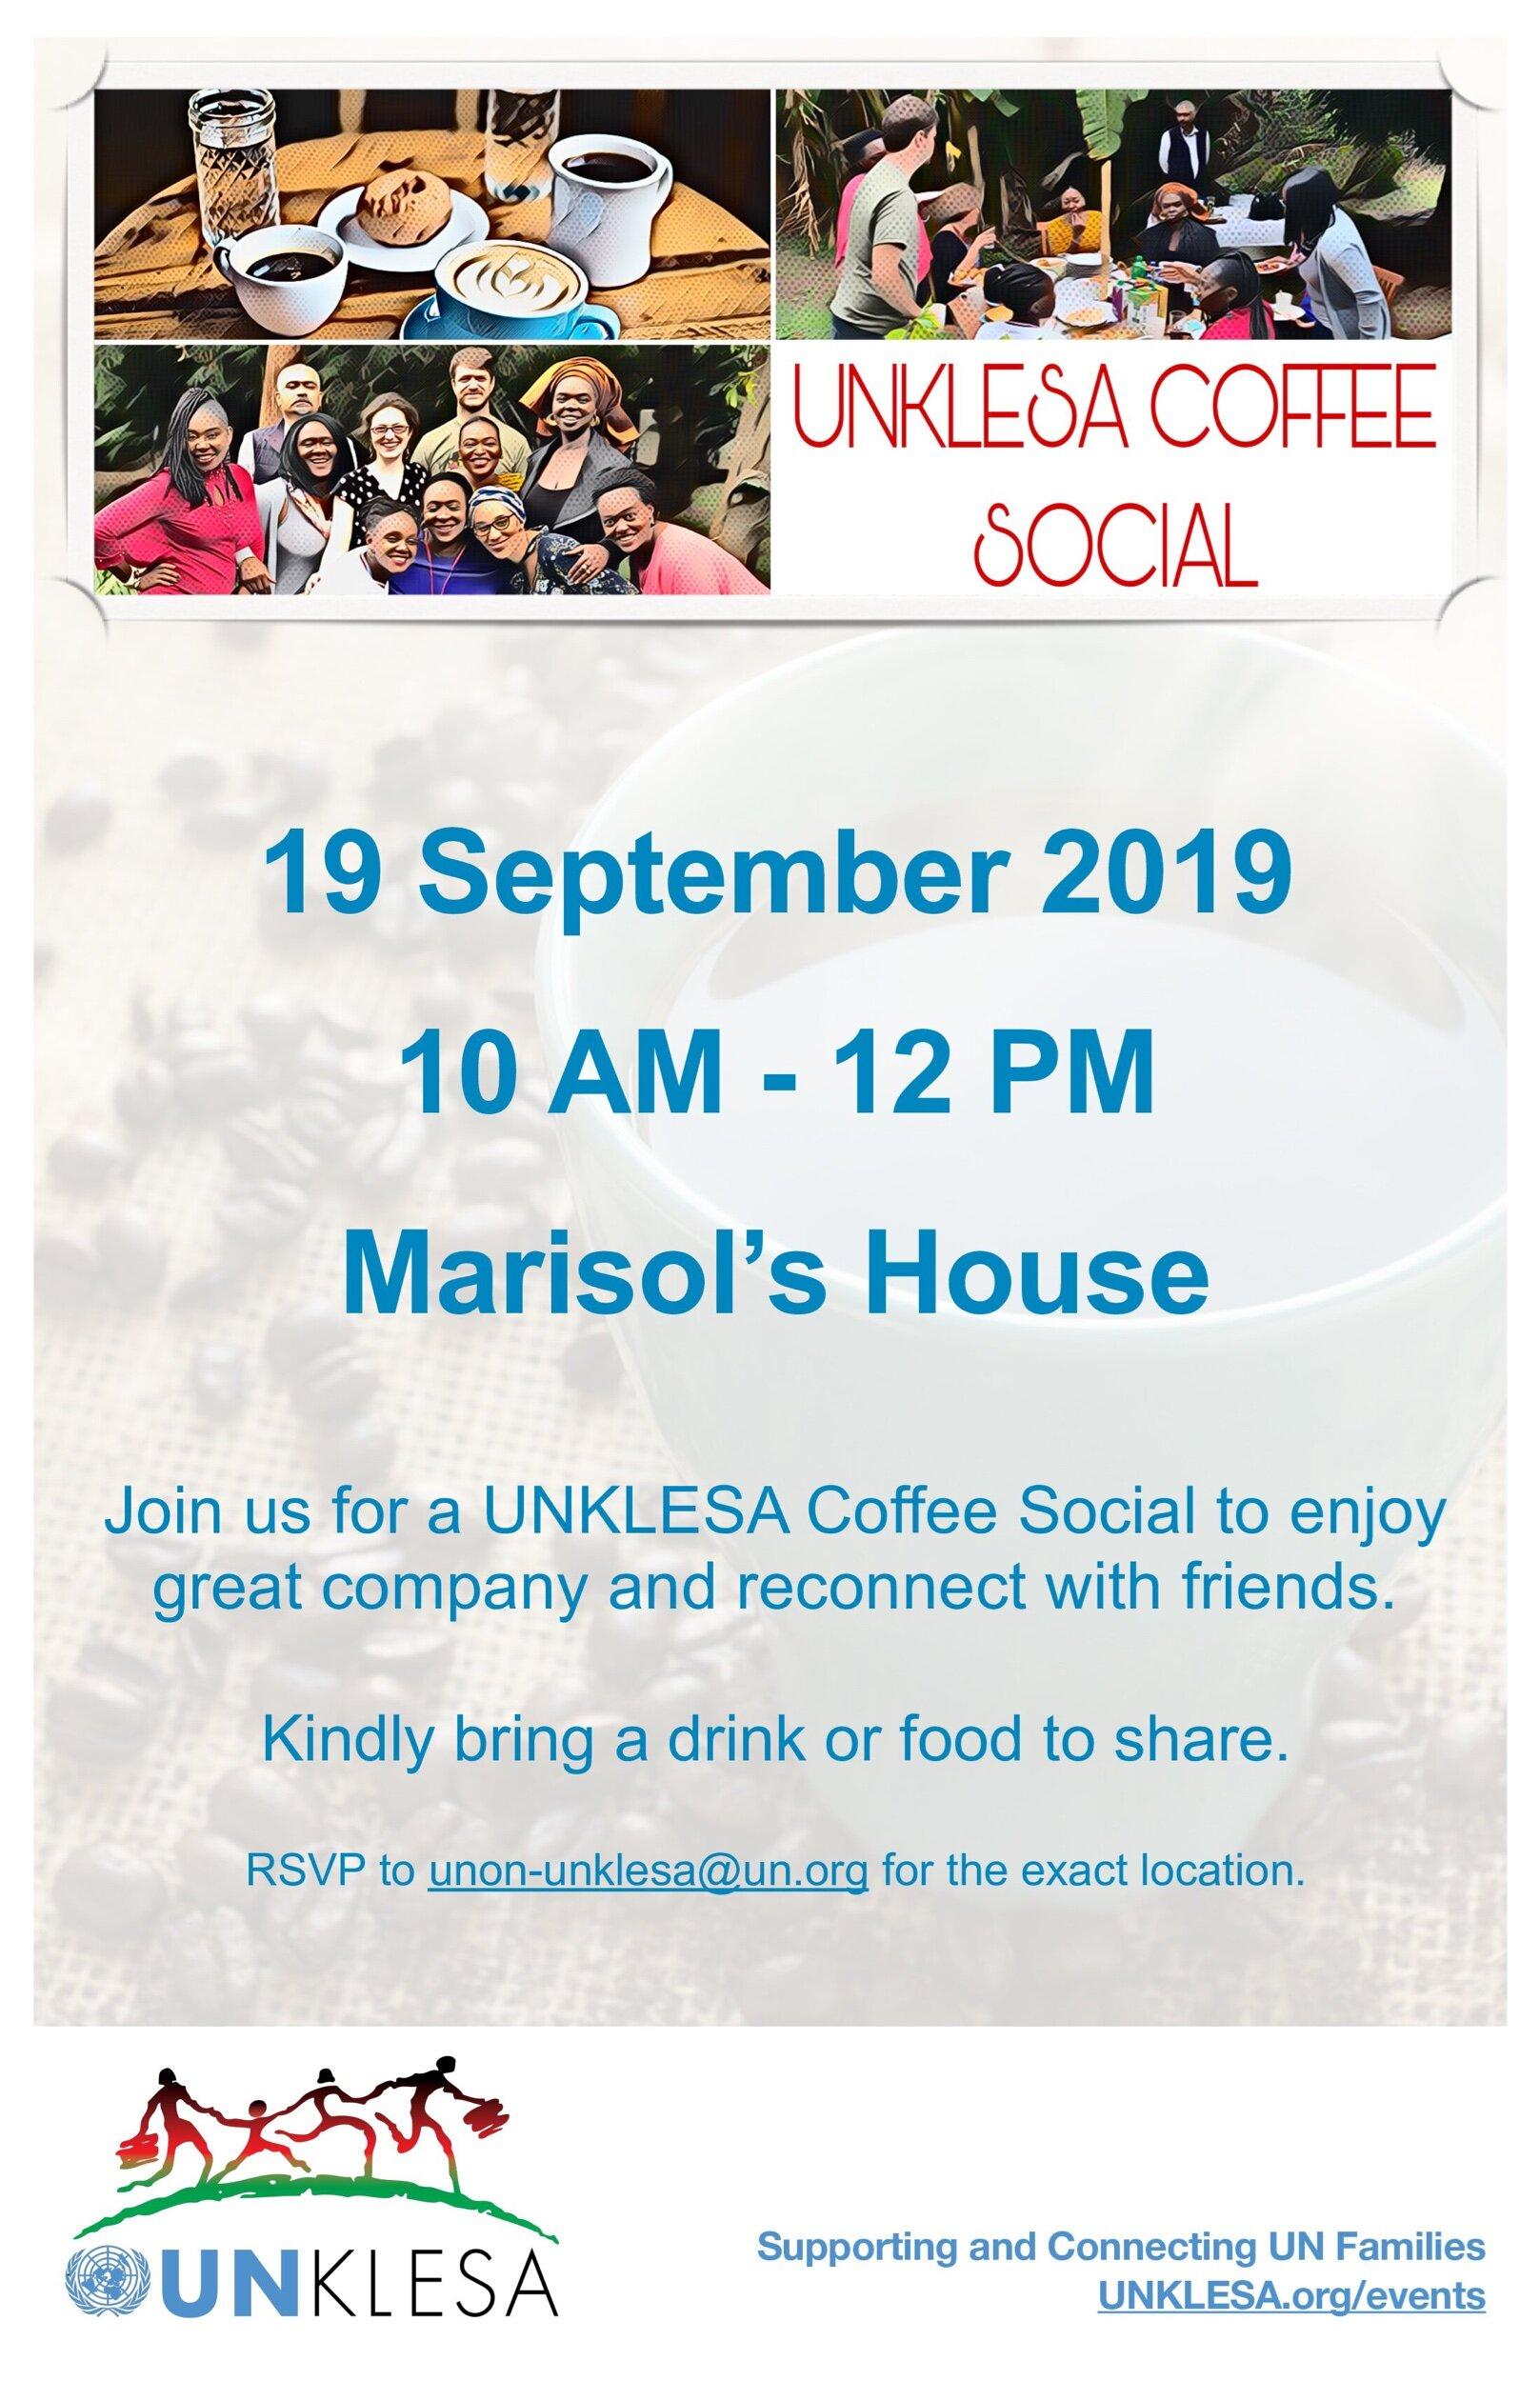 UNKLESA_CoffeeSocial_2019_September.jpeg